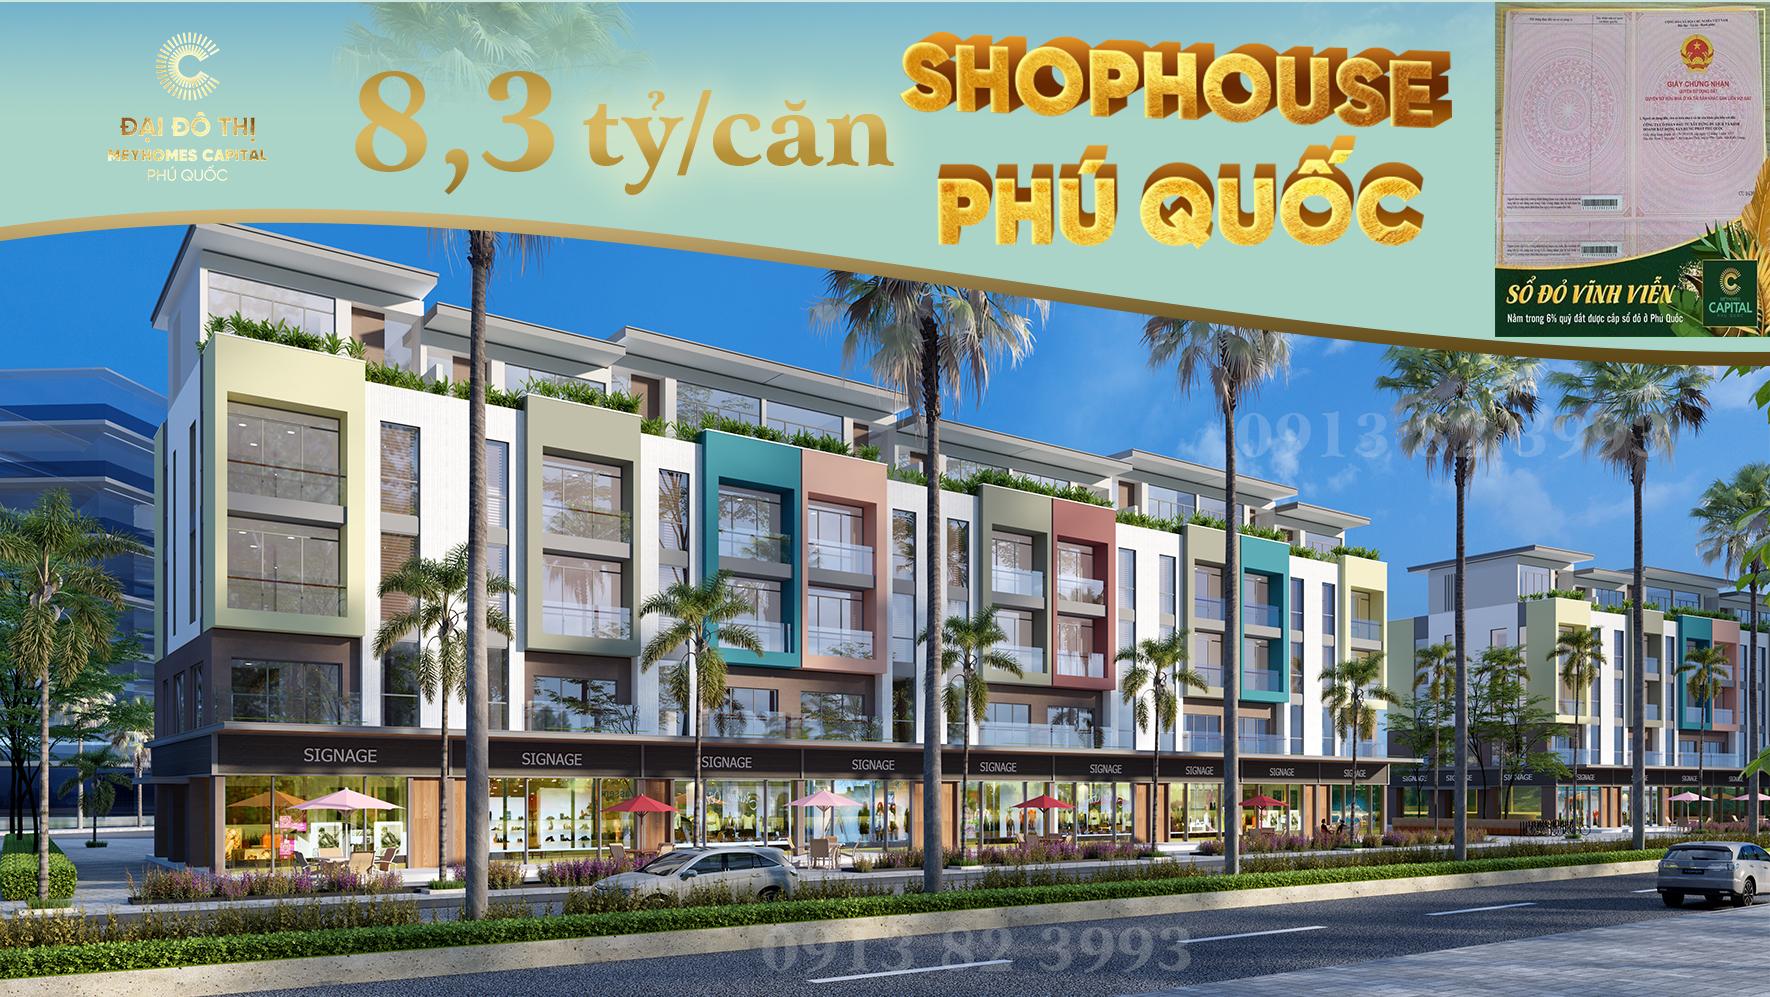 capital phuquoc 0913823939